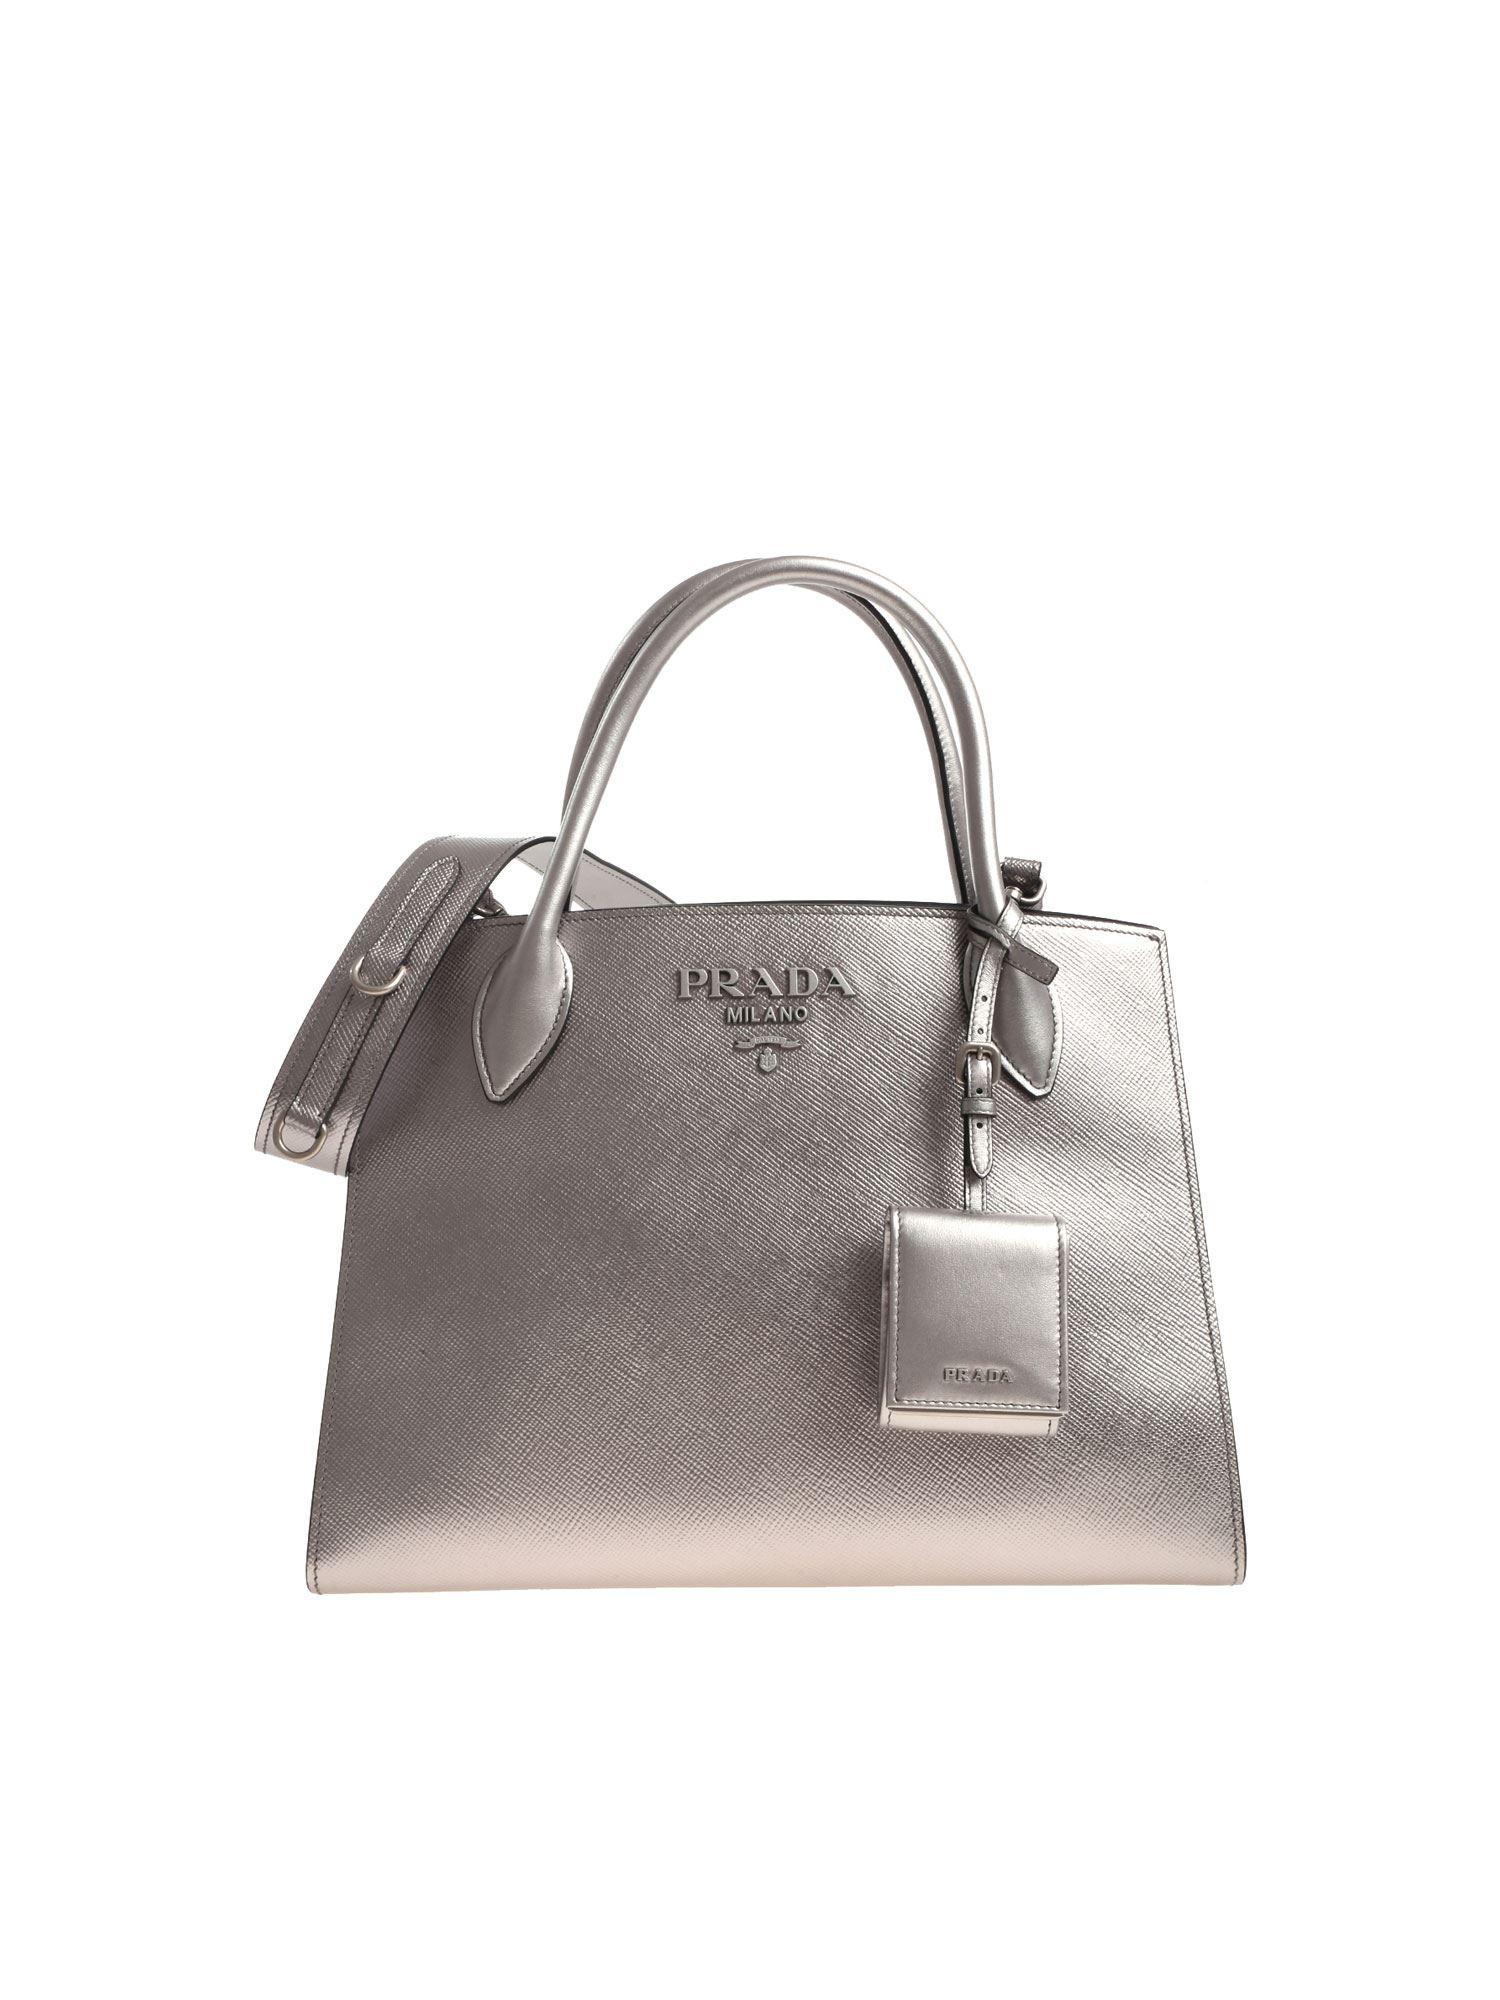 410c08cf6abd Lyst - Prada Silver Leather Shoulder Bag in Metallic